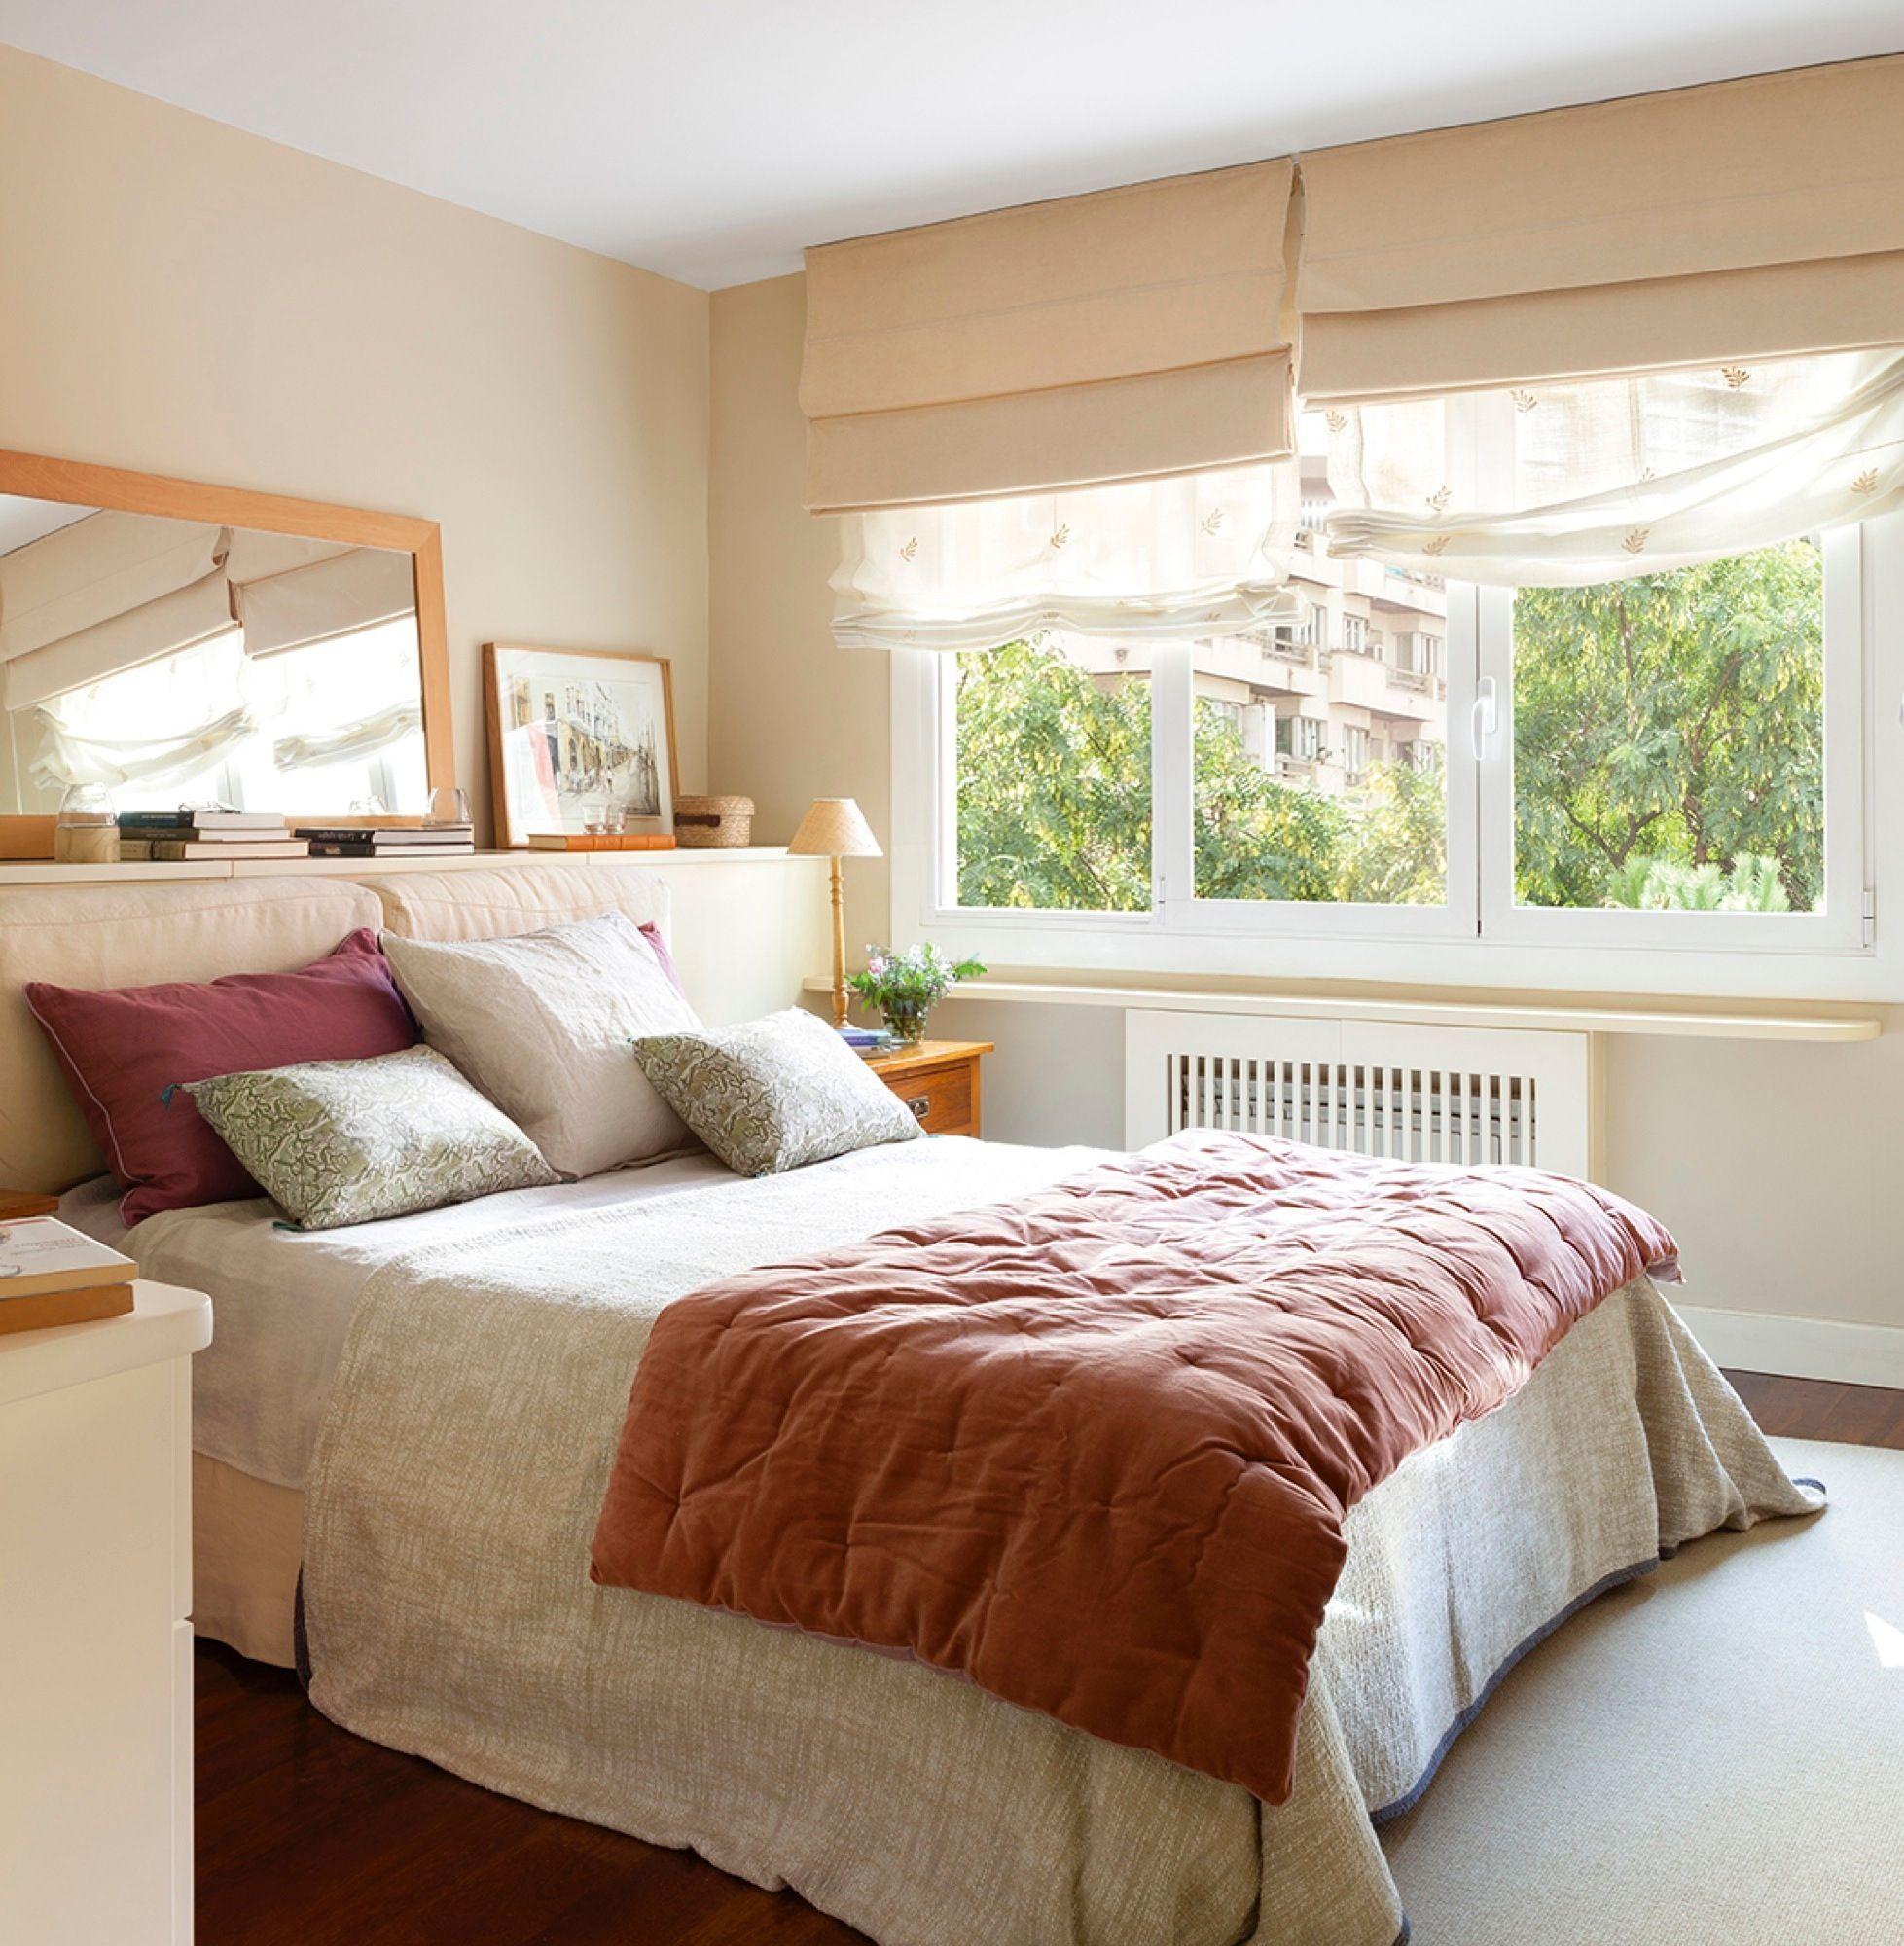 Dormitorio principal cabecero realizado por carpinter a - Lamparas de mesilla ...